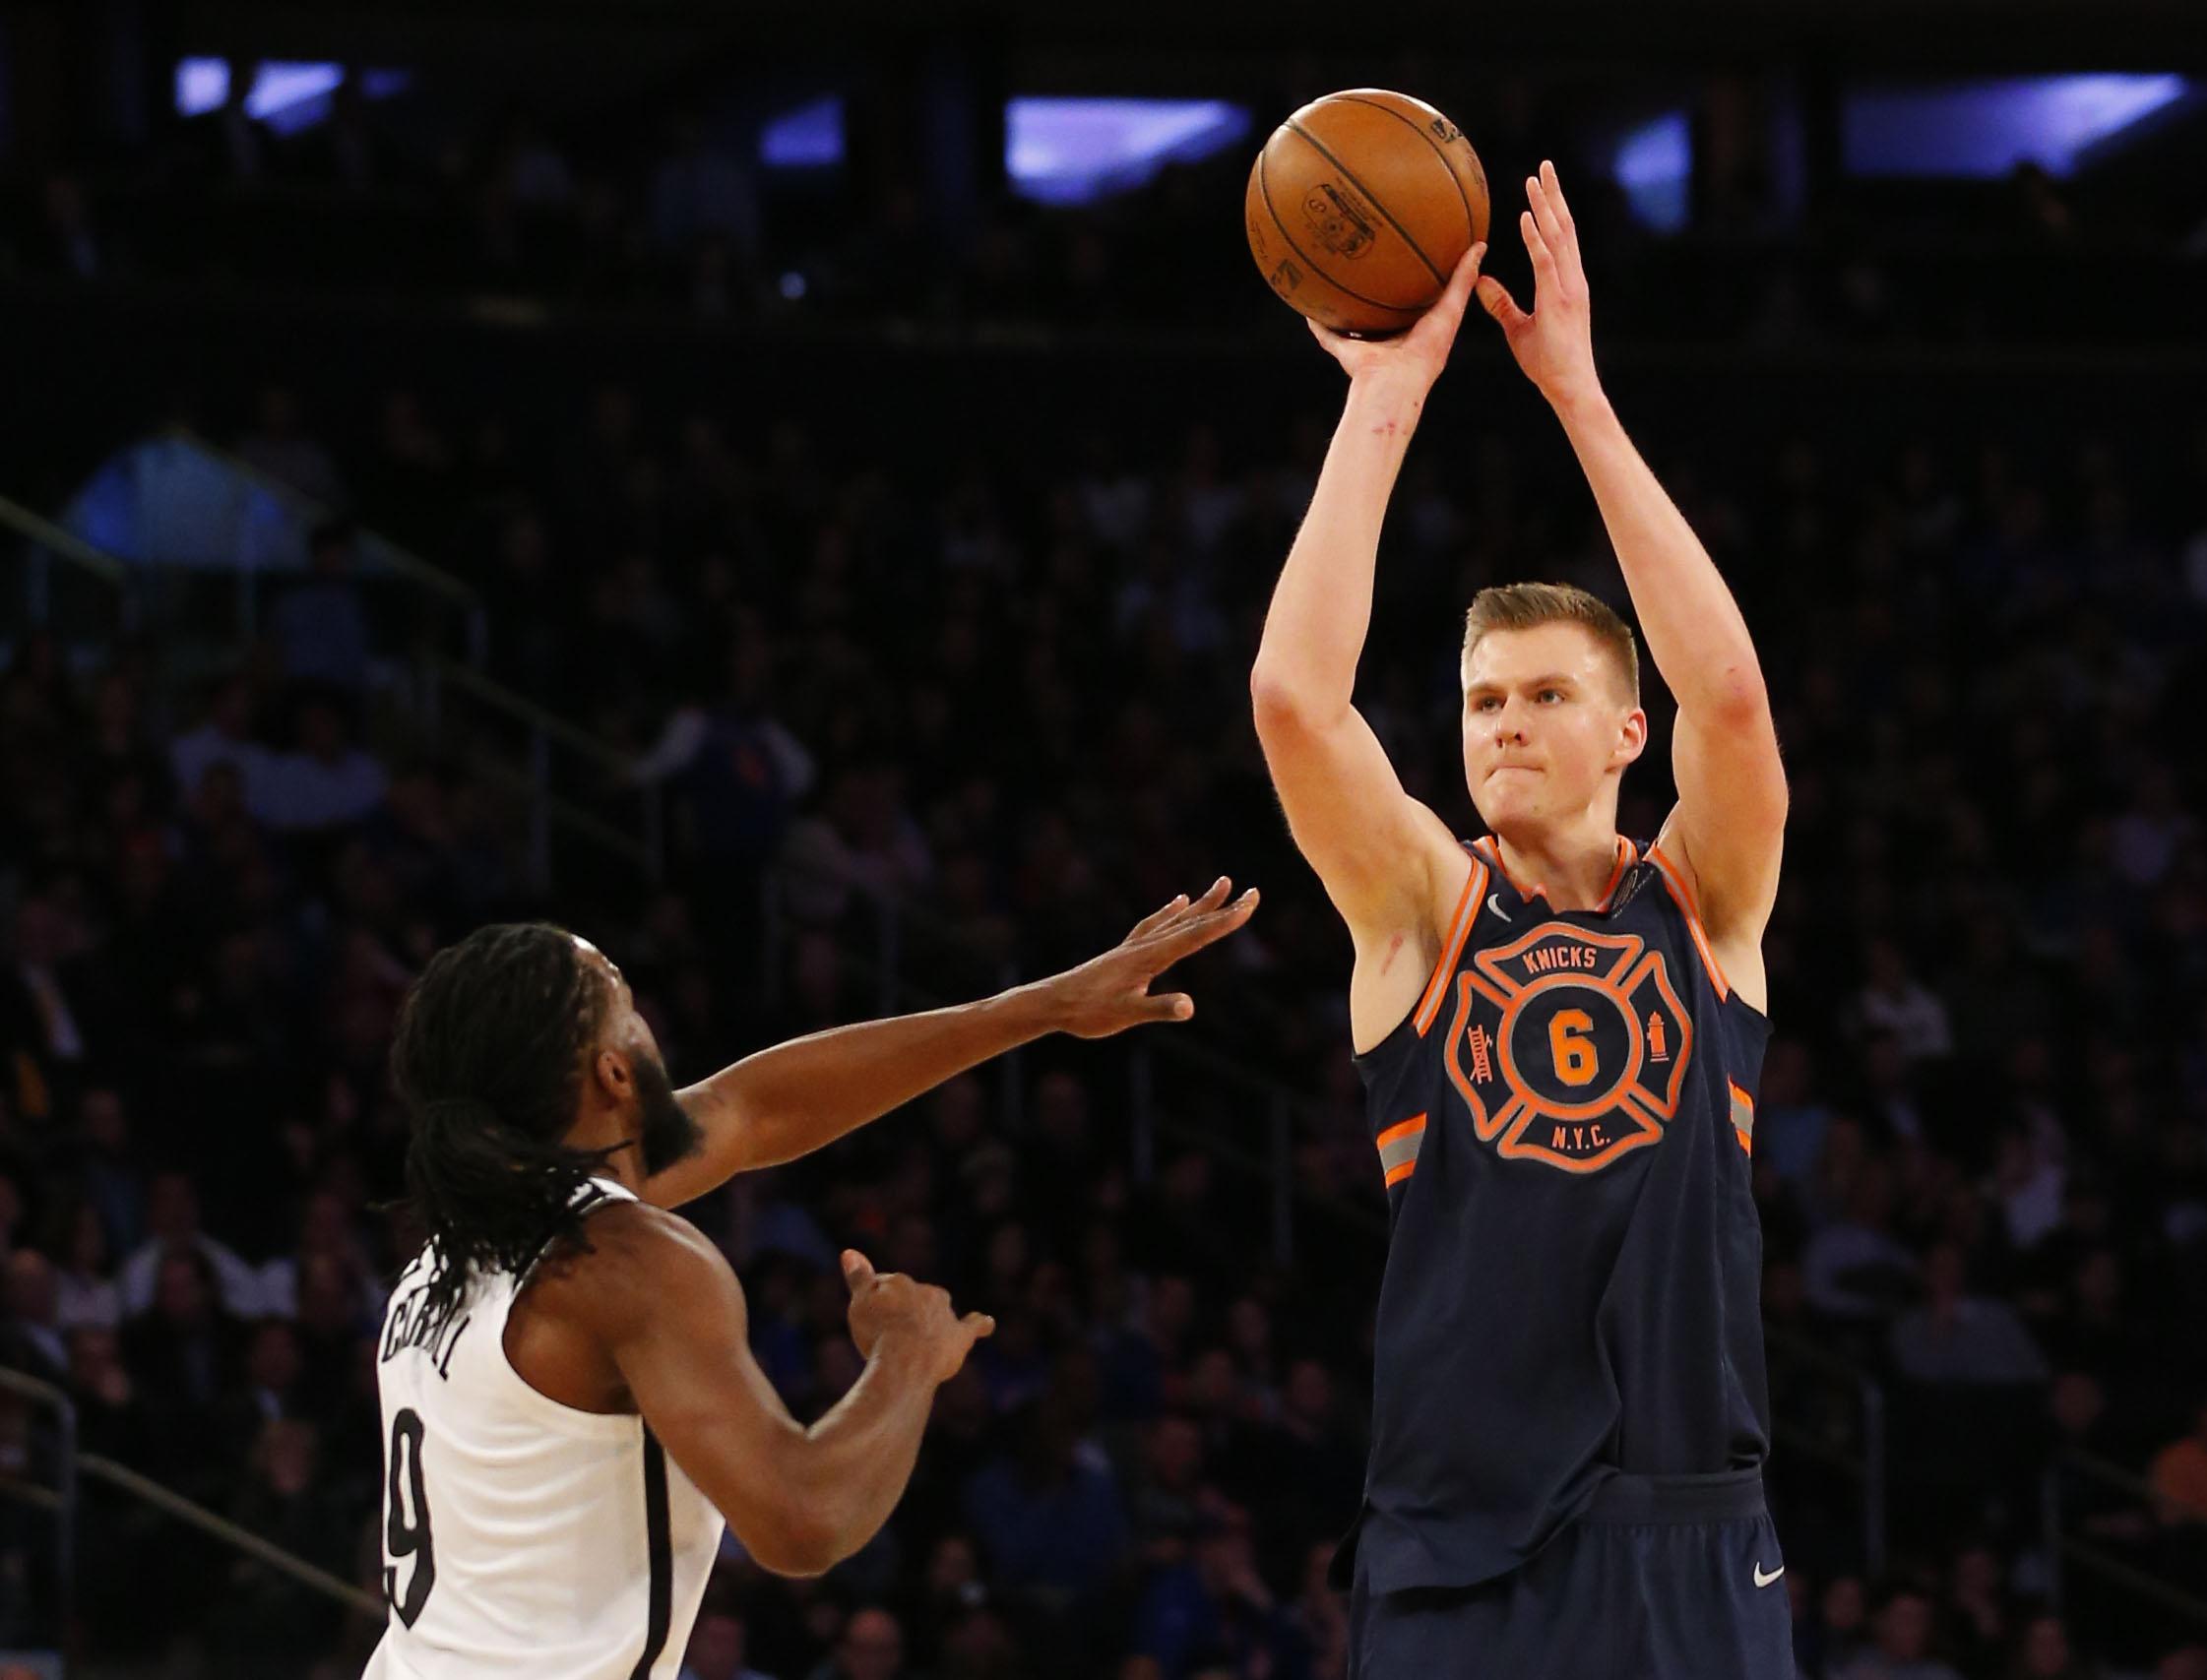 Kristaps Porzingis' Long Range Prowess Helps Knicks Defeat Nets